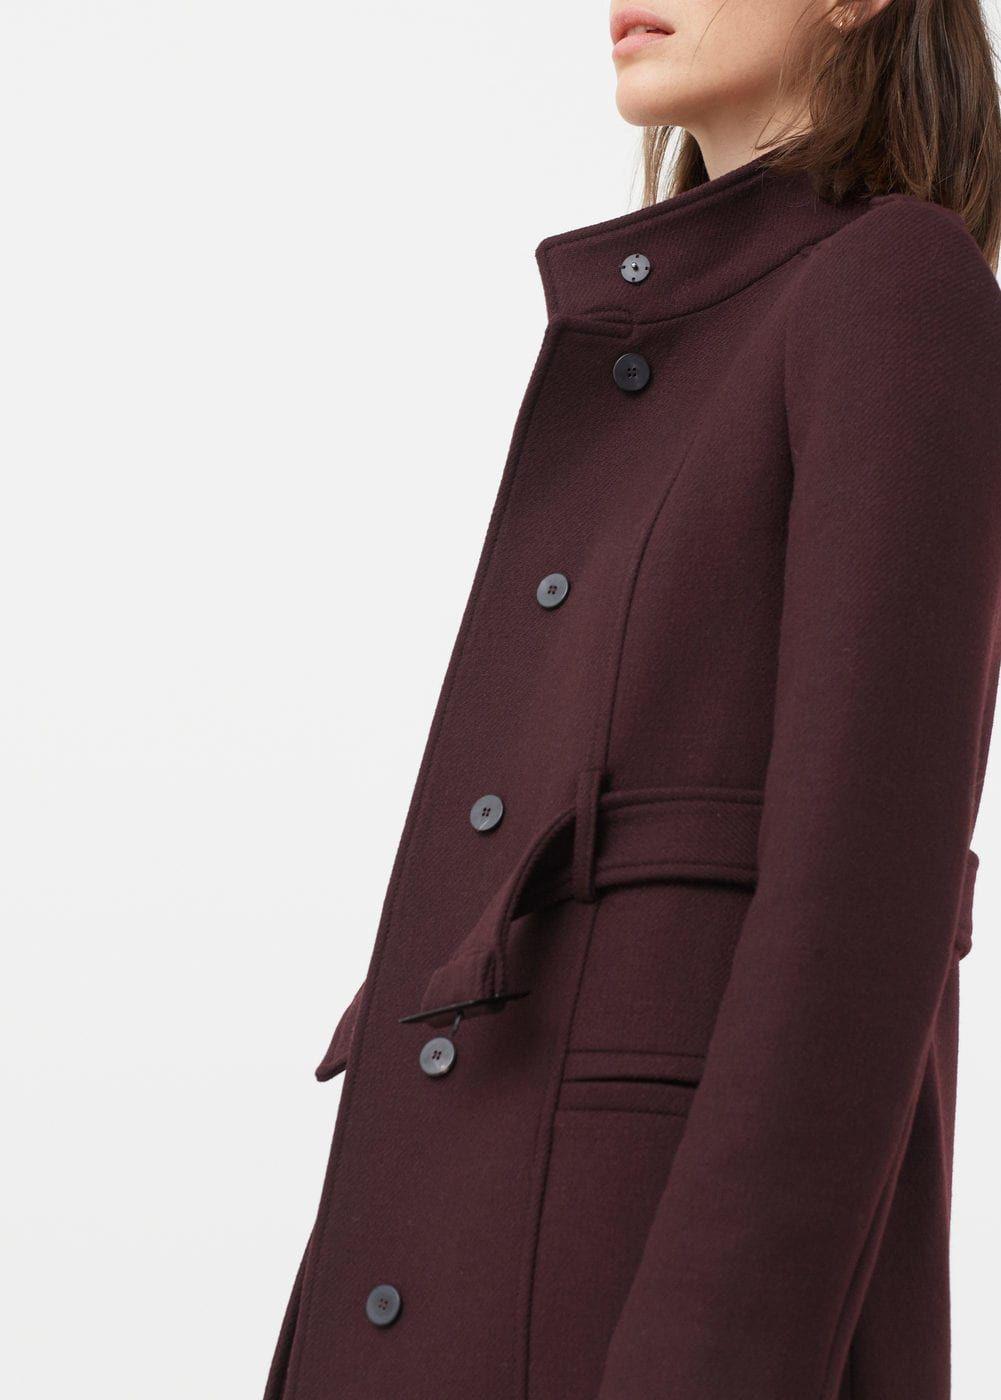 lana womenCoat MujerWool Abrigo cinturón coatCoats for nkOPX0N8w